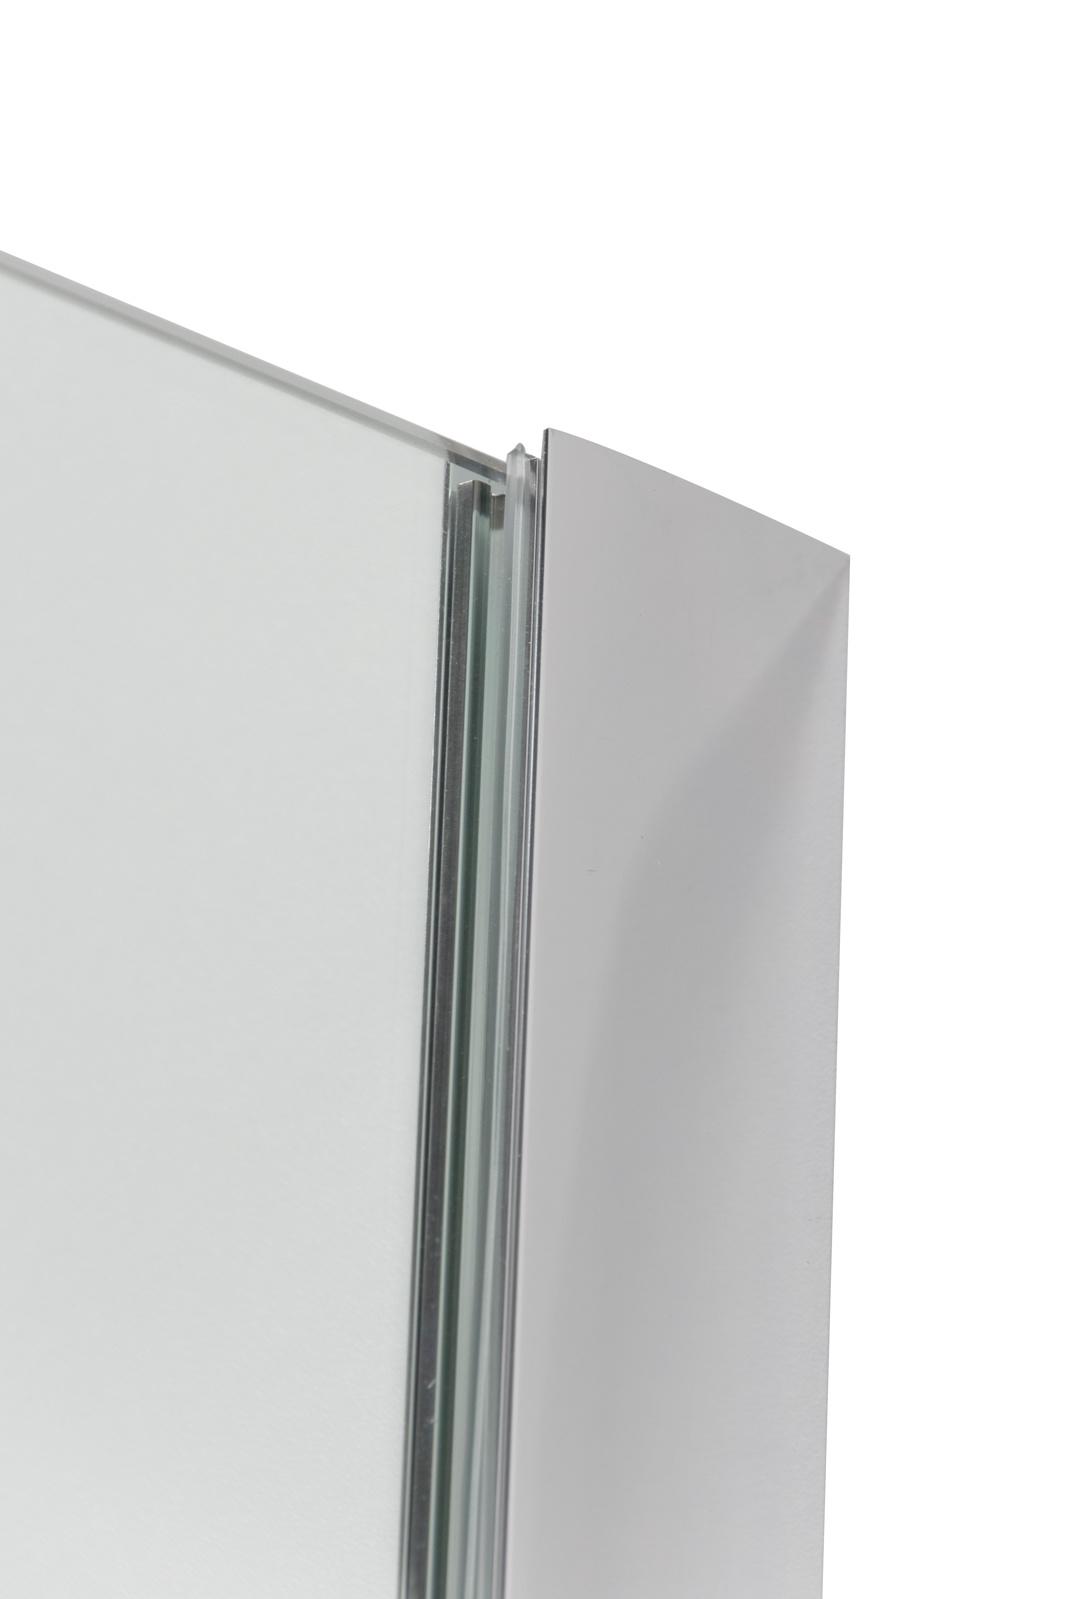 Linea Uno Inloopdouche Göteborg 120 x 200 cm